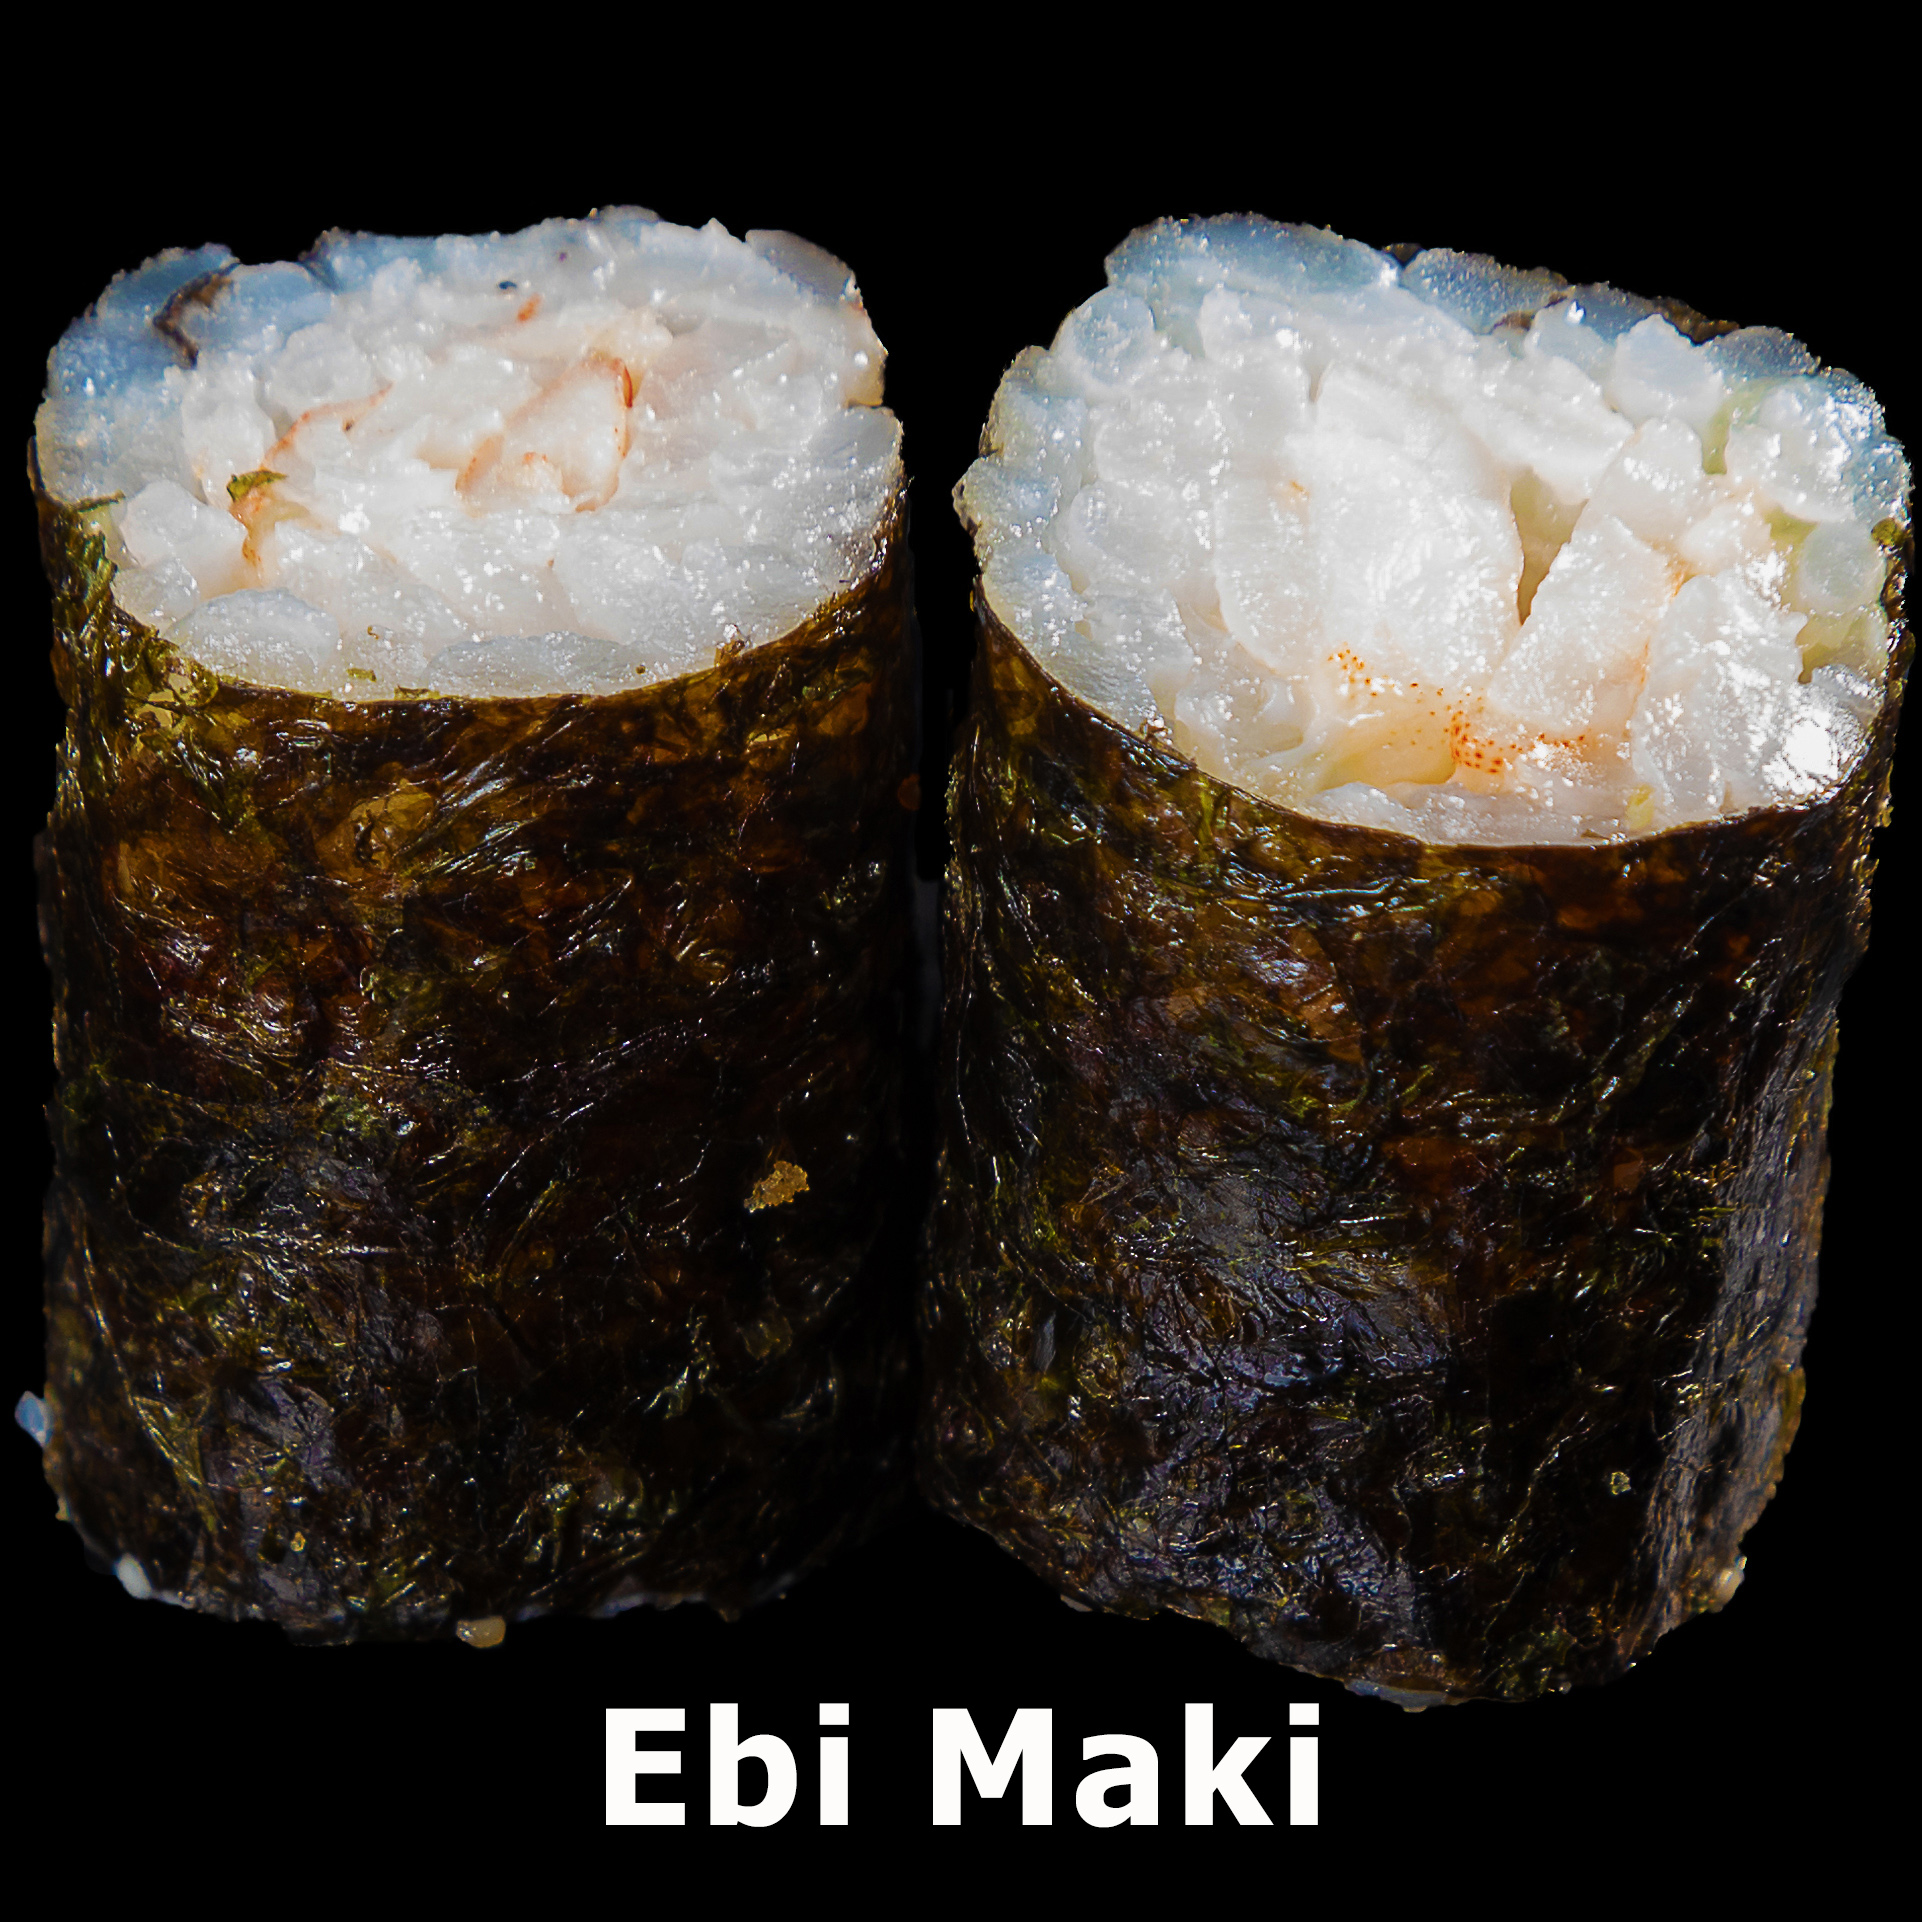 26. Ebi Maki